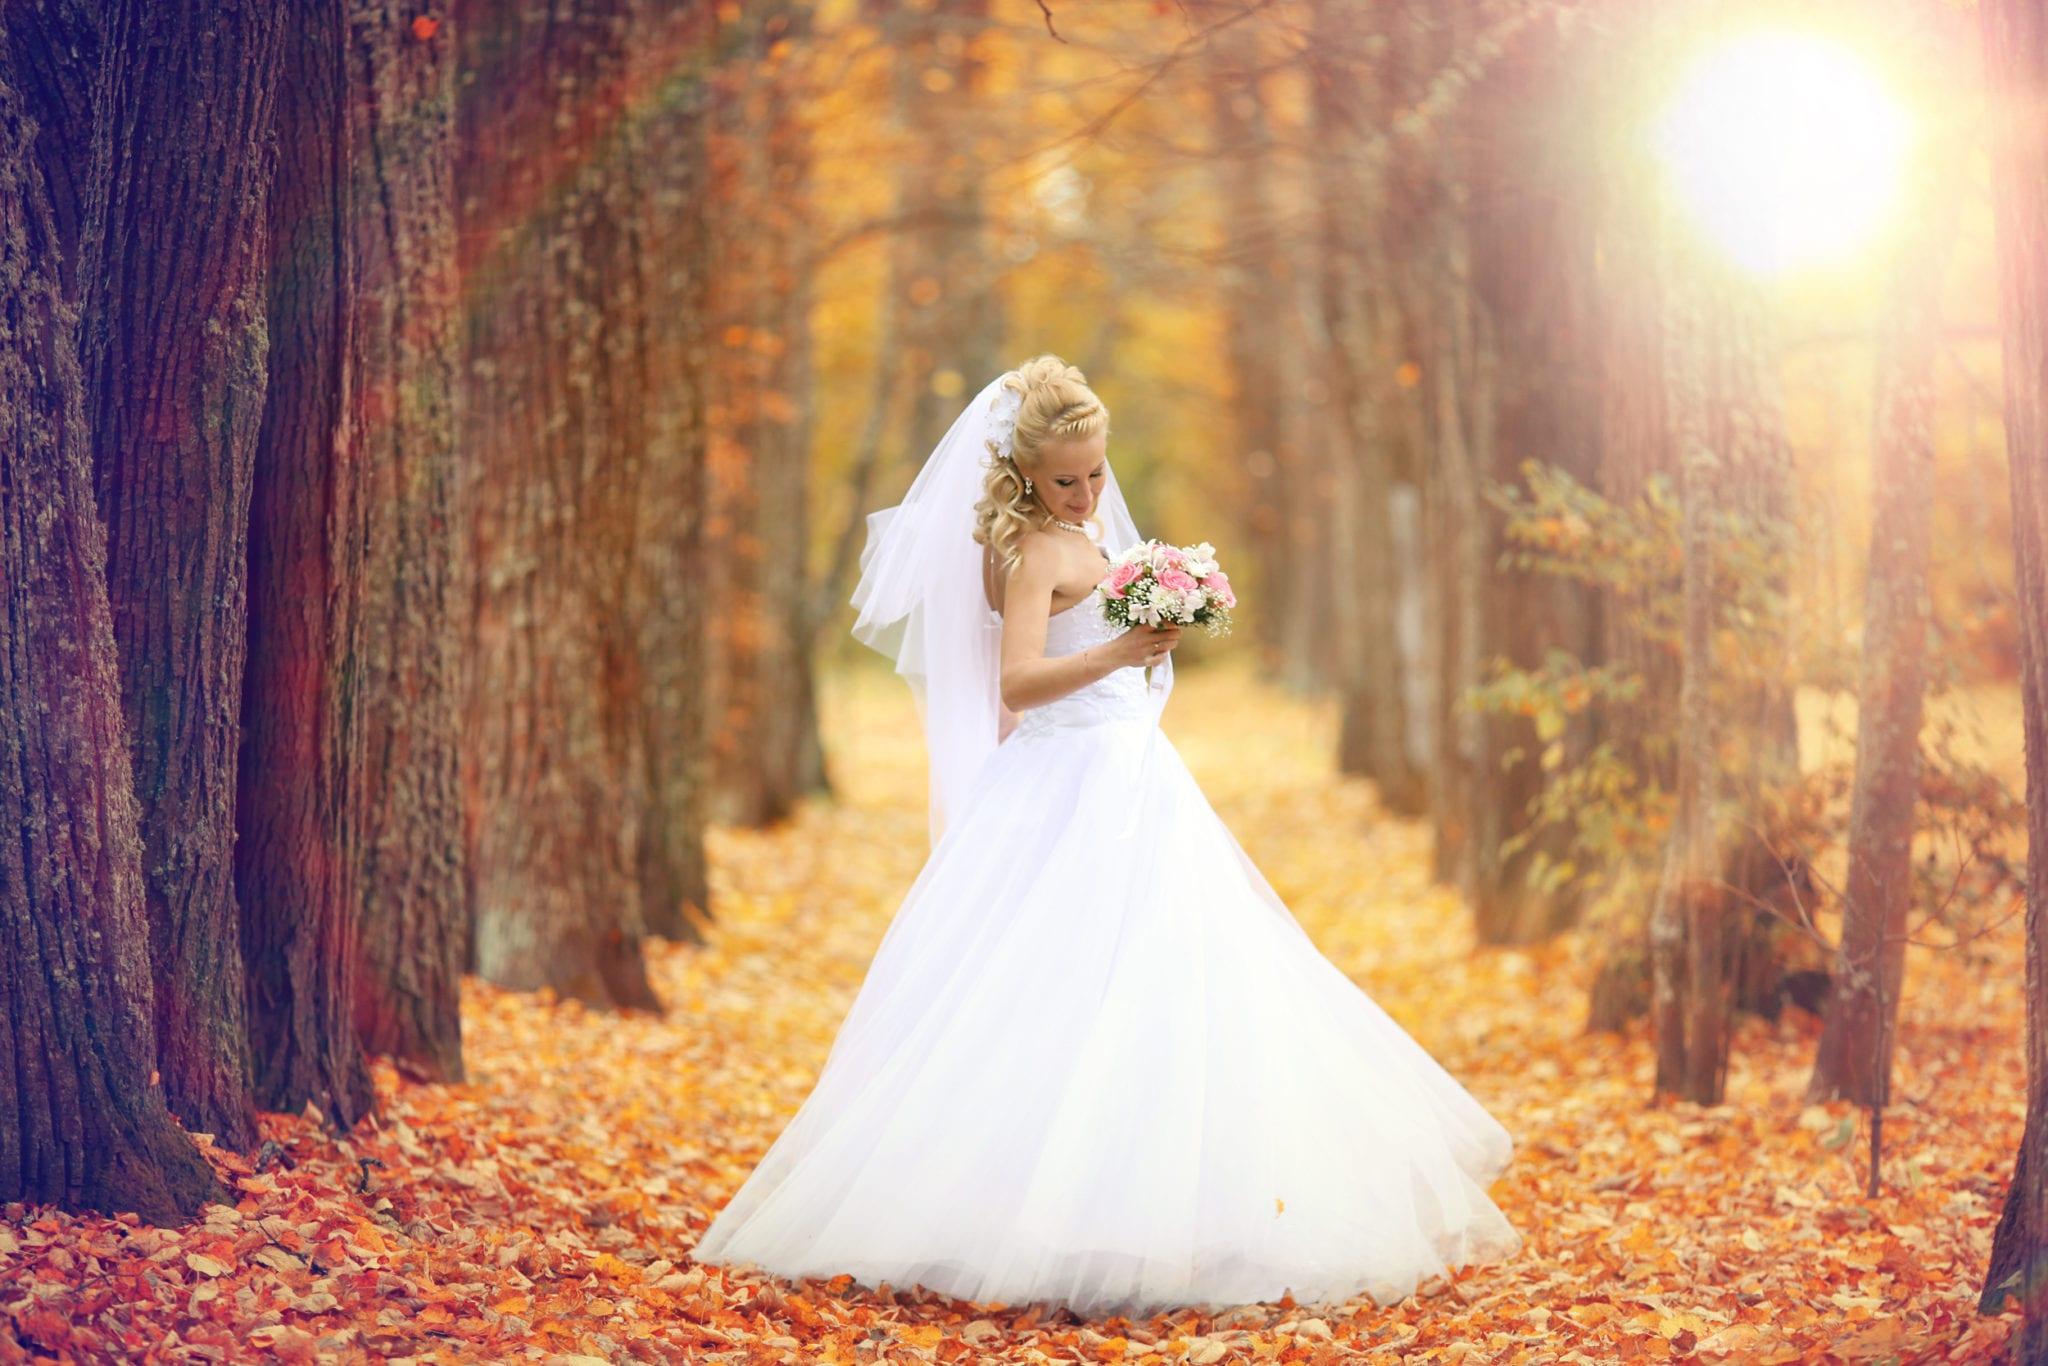 12 fall wedding color combos to steal geronimo oaks weddings 12 fall wedding color combos to steal ombrellifo Choice Image